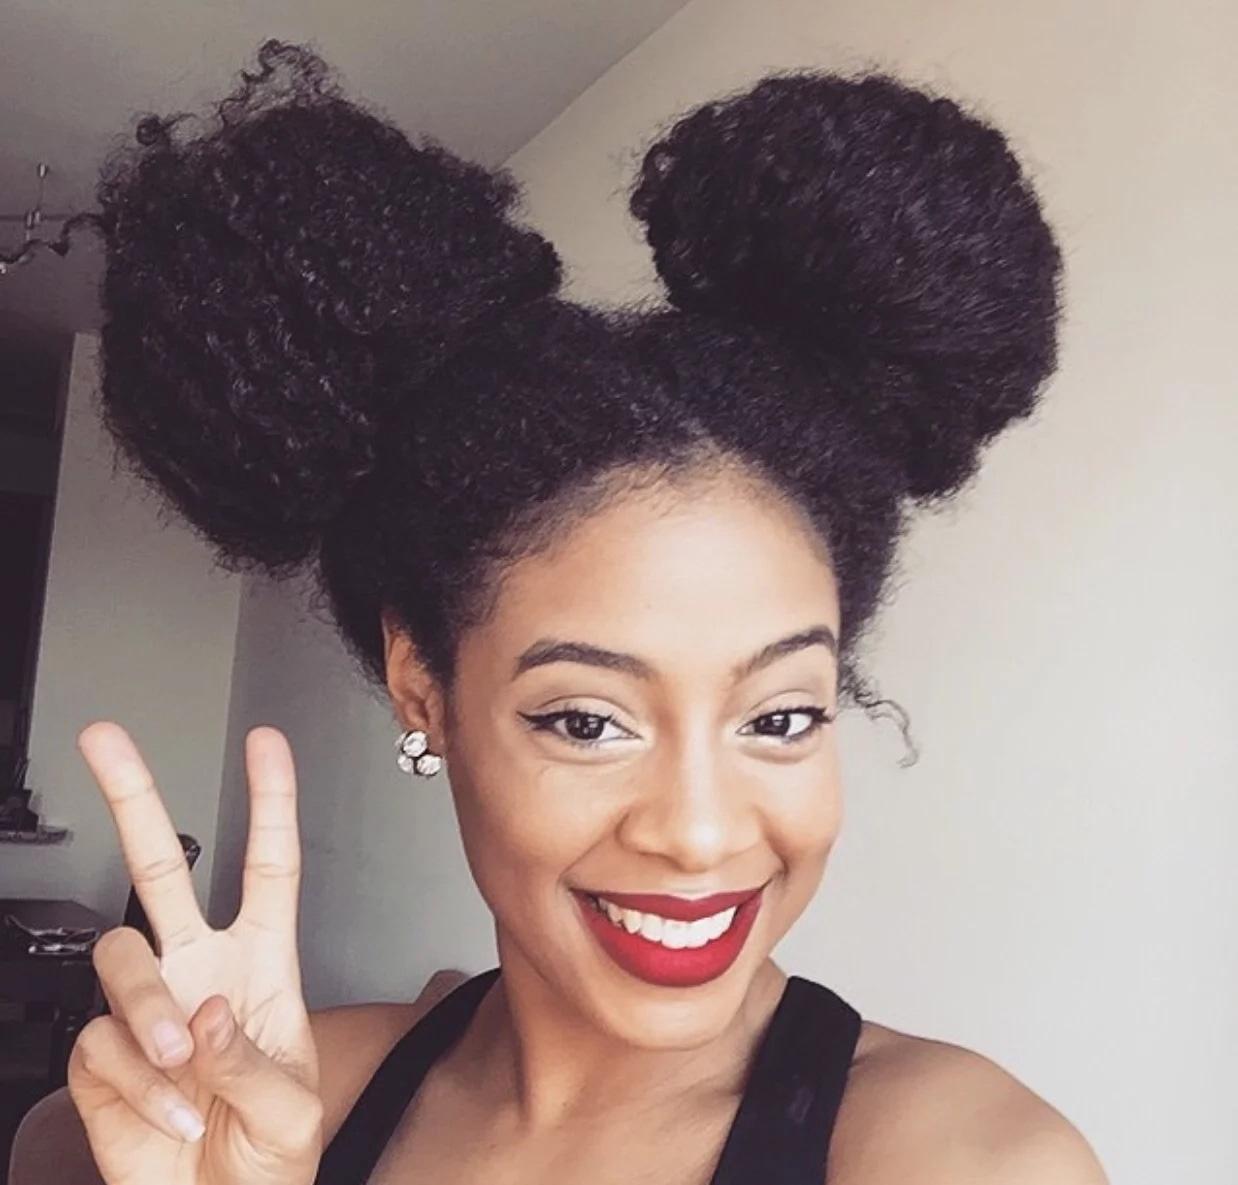 Top 30 Black Natural Hairstyles For Medium Length Hair In 2020